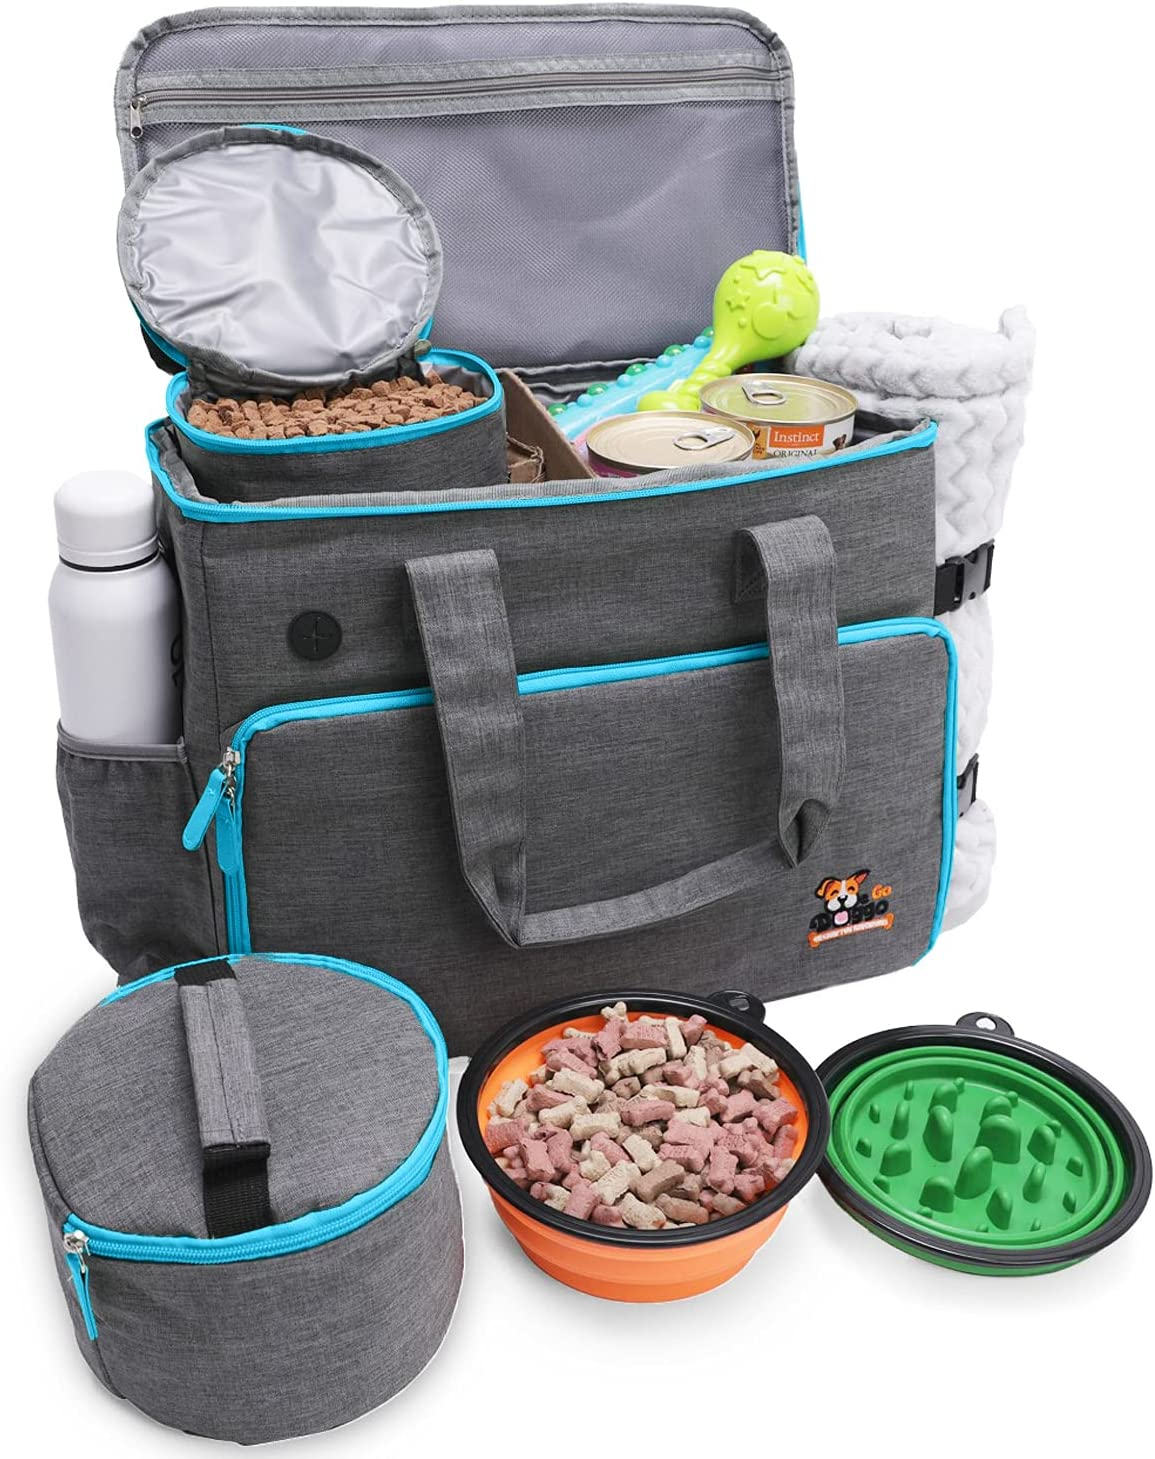 WeGo Doggo Airline-Compliant Leakproof Dog Travel Bag - 10 Dog Stuff Storage Pockets, Poop Bag Dispenser, 2 BPA-Free Collapsible Dog Bowl Food Containers - 16 Shelter Meals Donated Per Pet Travel Bag